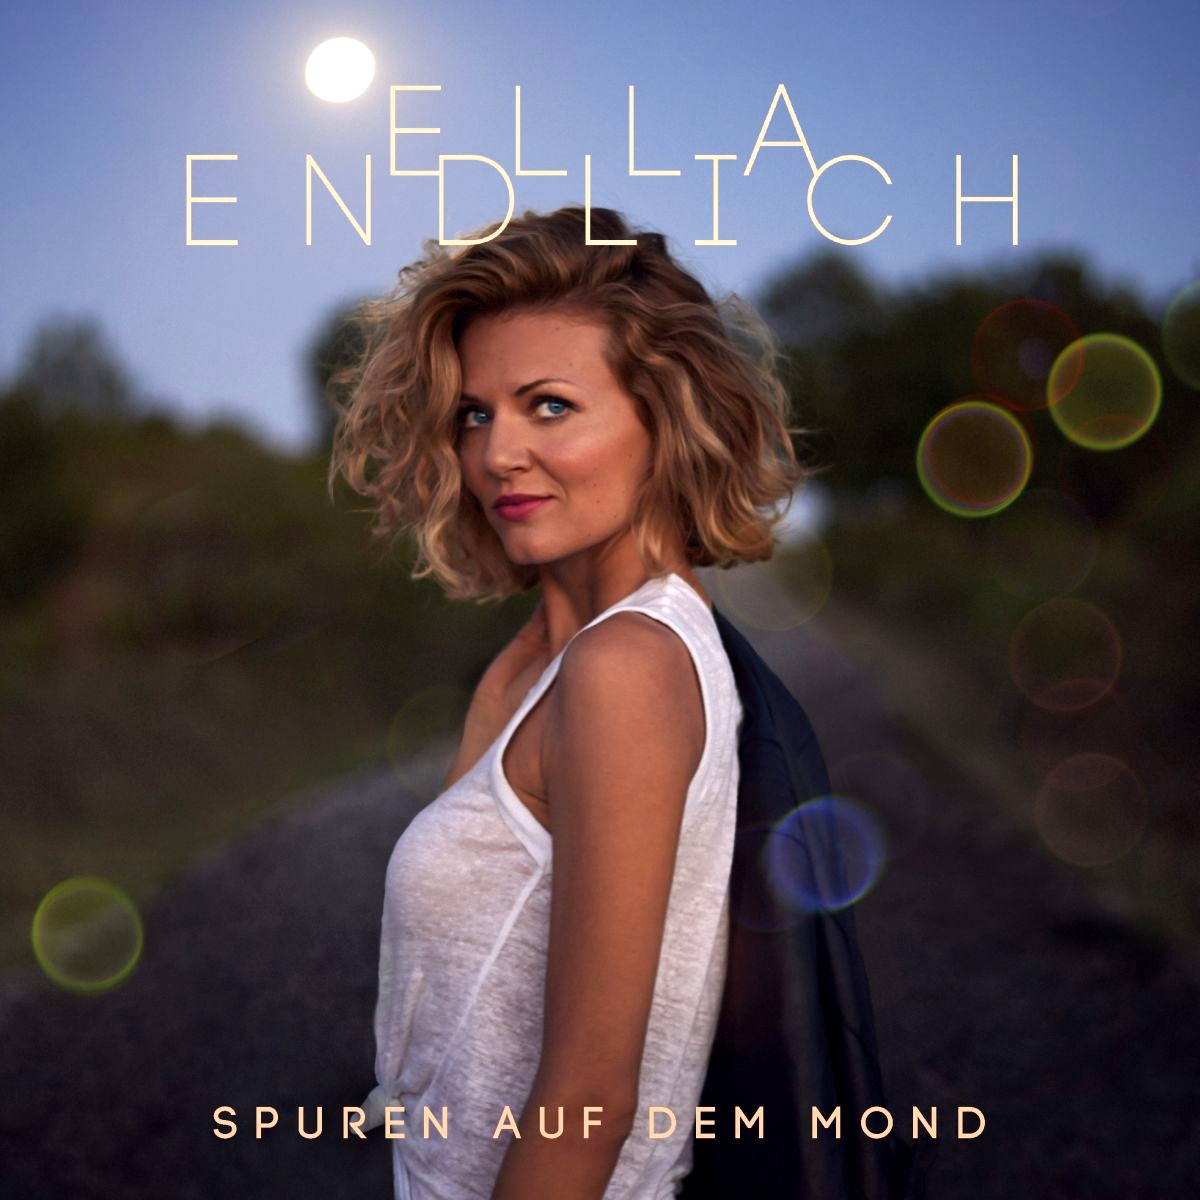 nackt Endlich Ella Ella Endlich: